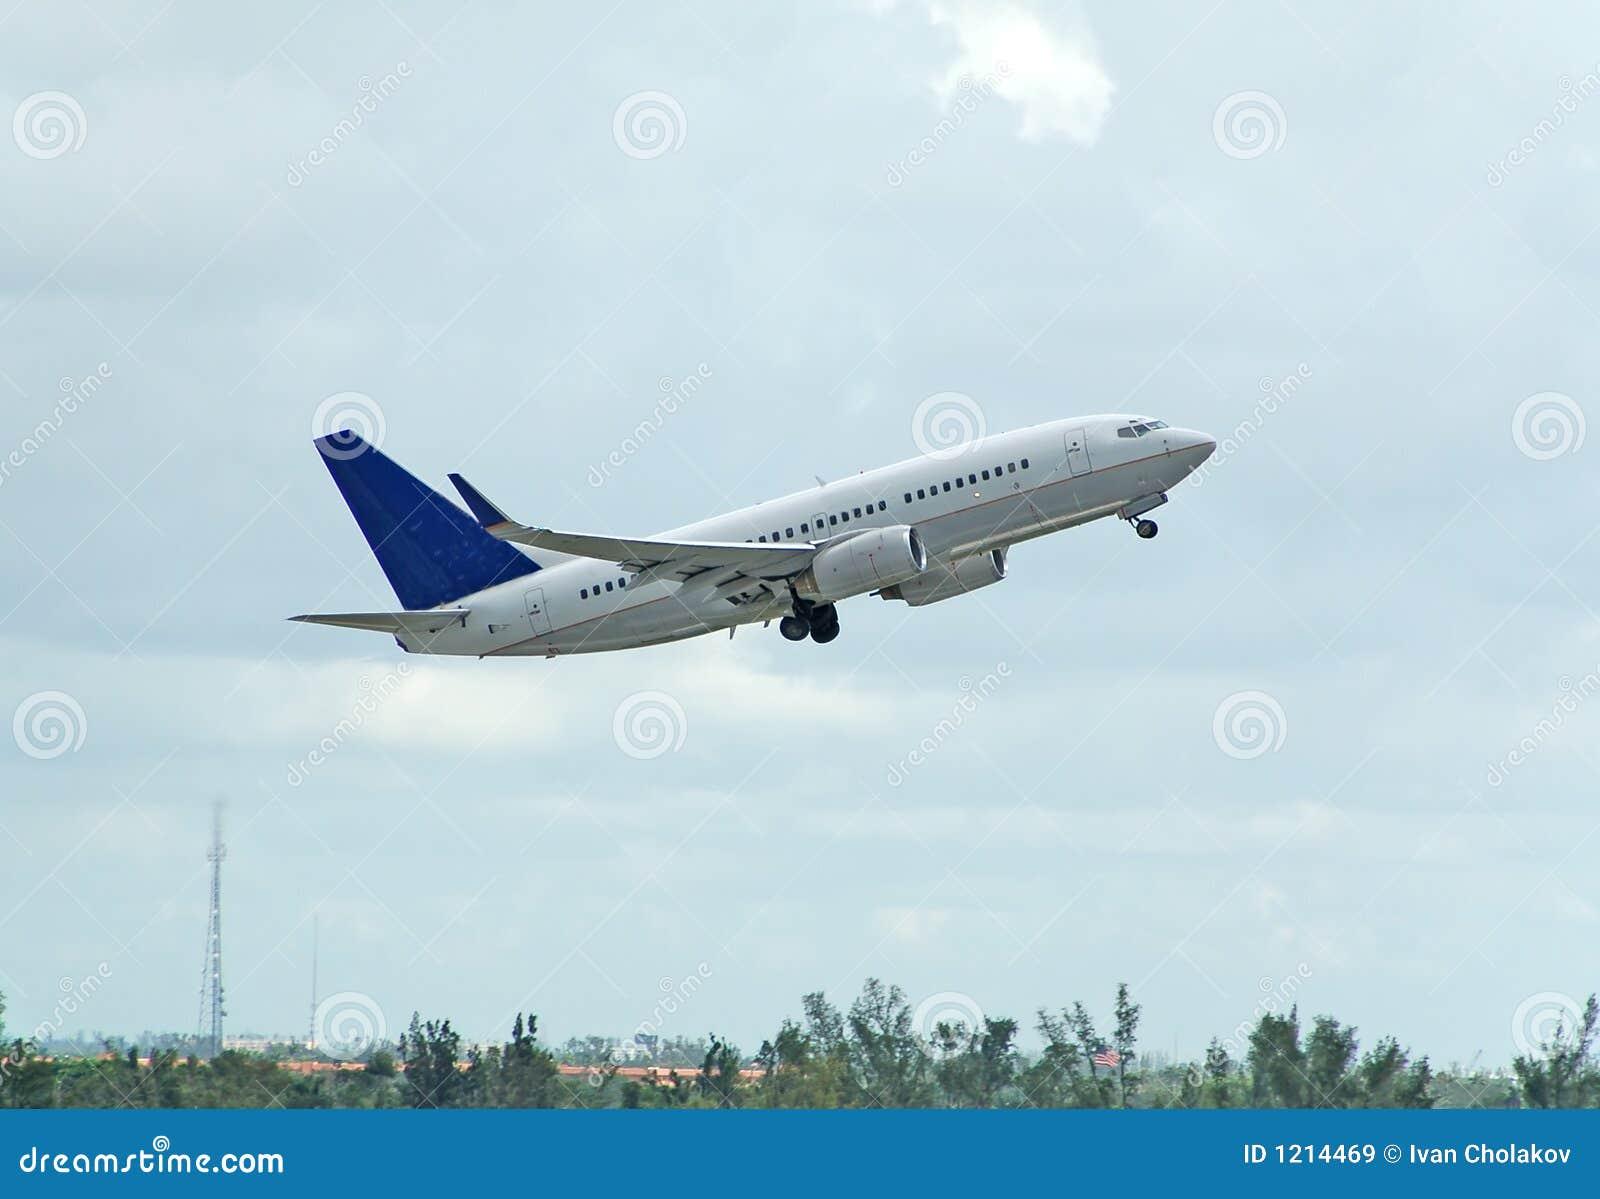 Boeing 737 Passenger Jet Takeoff Royalty Free Stock Images - Image ...